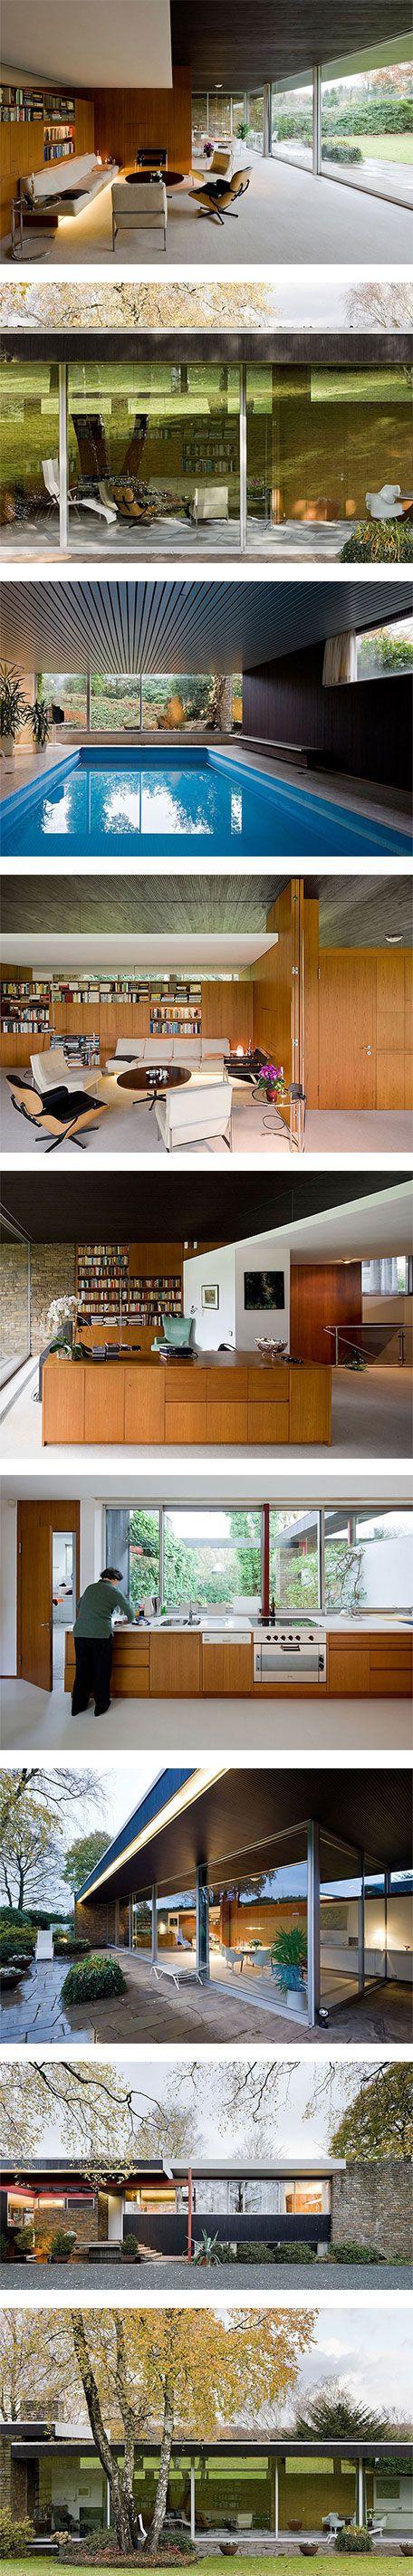 Pescher House by Richard Neutra featuring Furniture on Nuji.com #pescherhouse #richardneutra #architecture